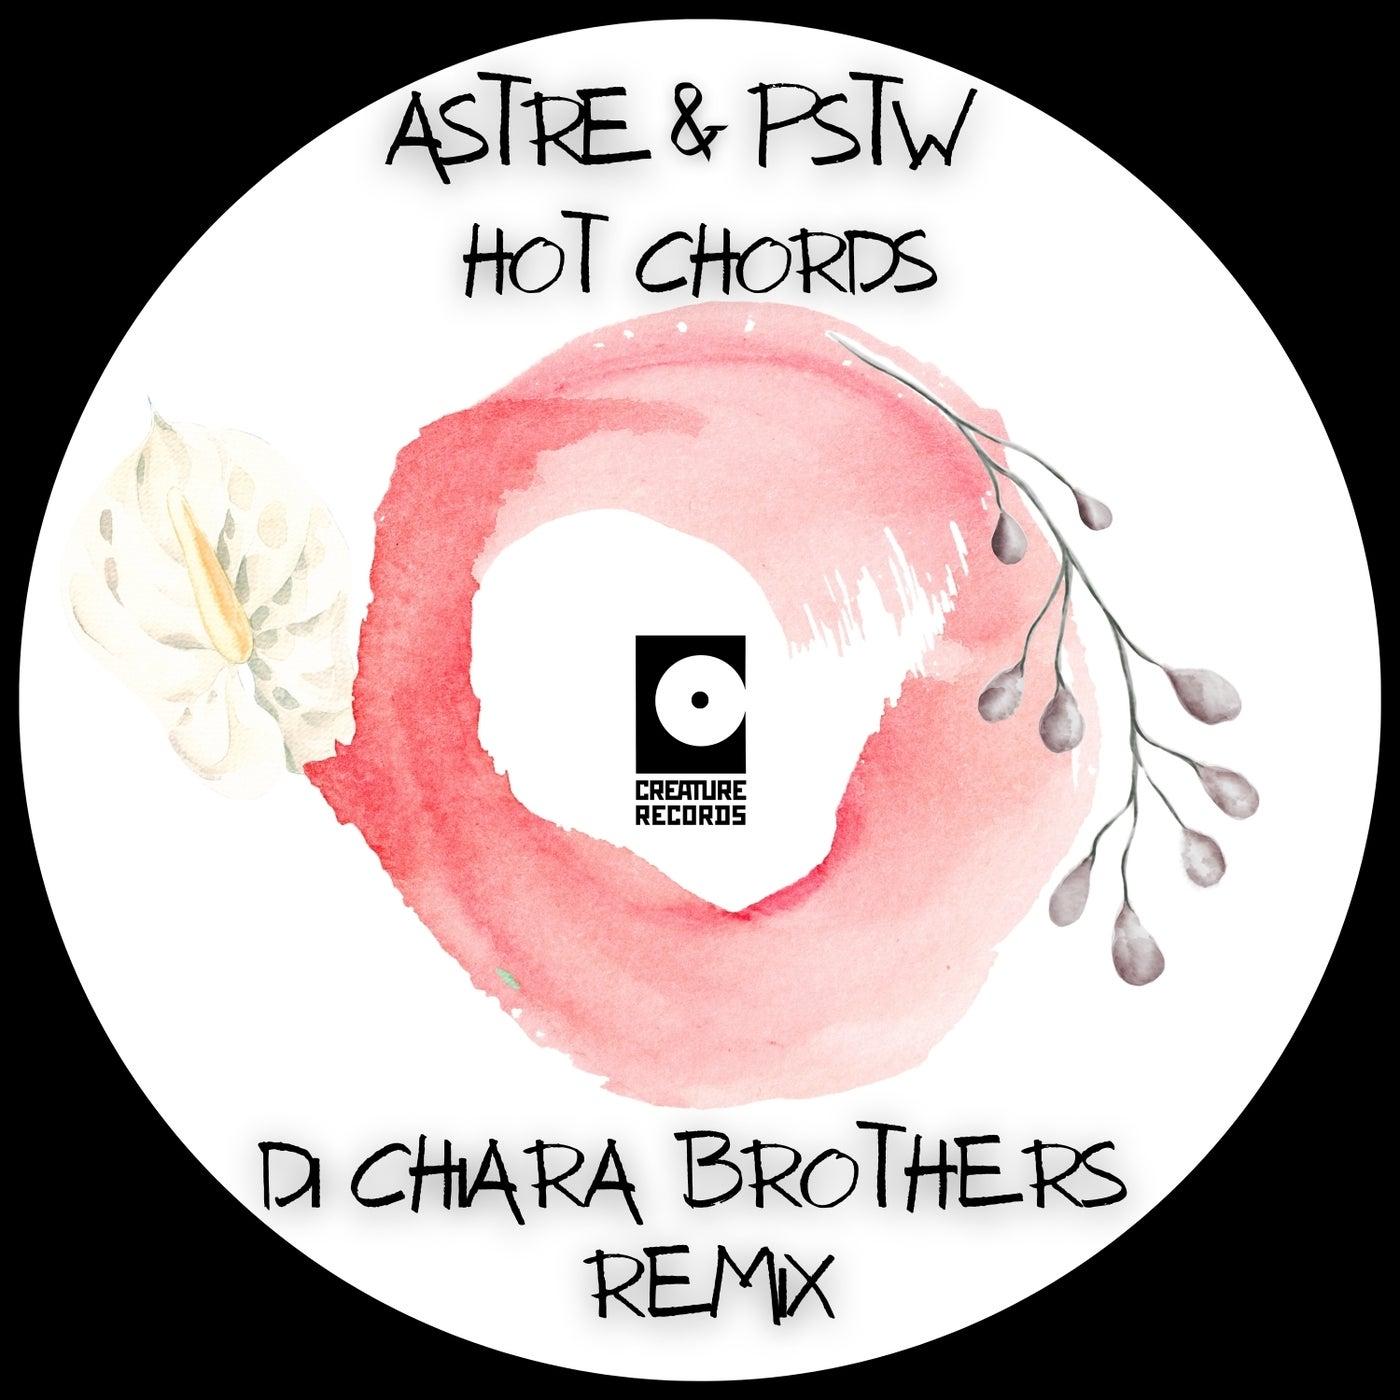 Hot Chords (Di Chiara Brothers Remix)